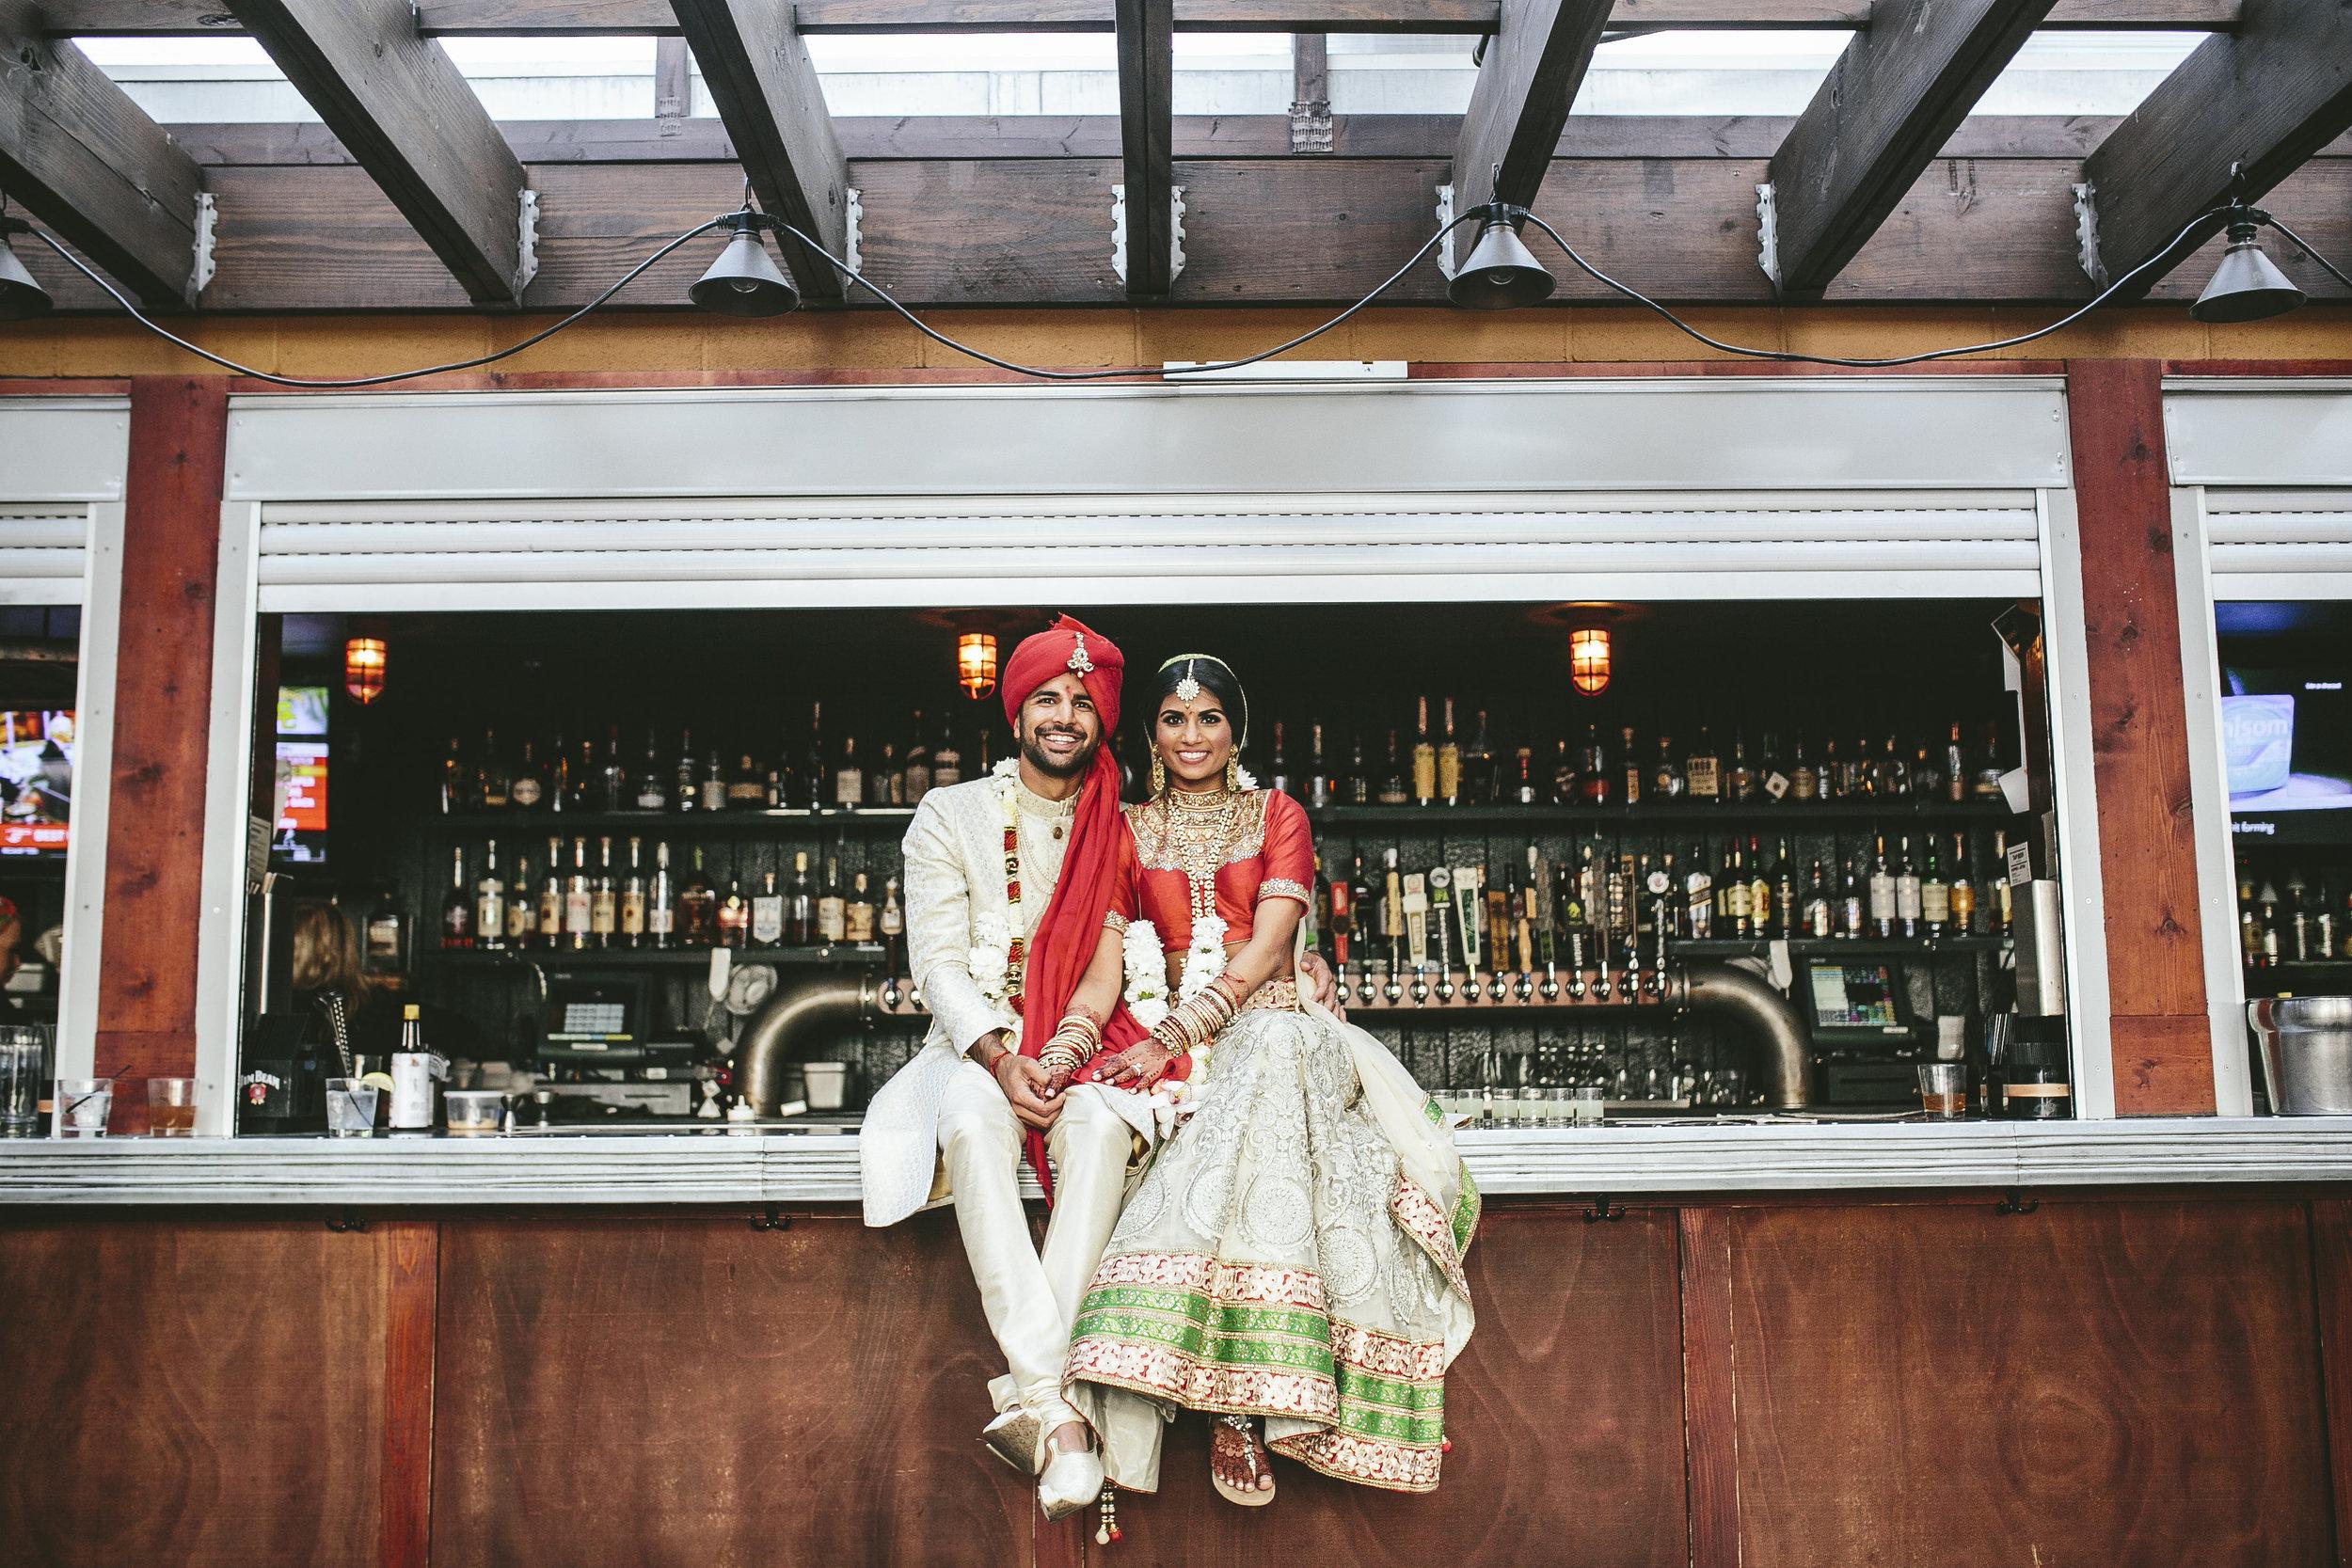 Acowsay_Minnesota_Wedding_Video_Bar.JPG